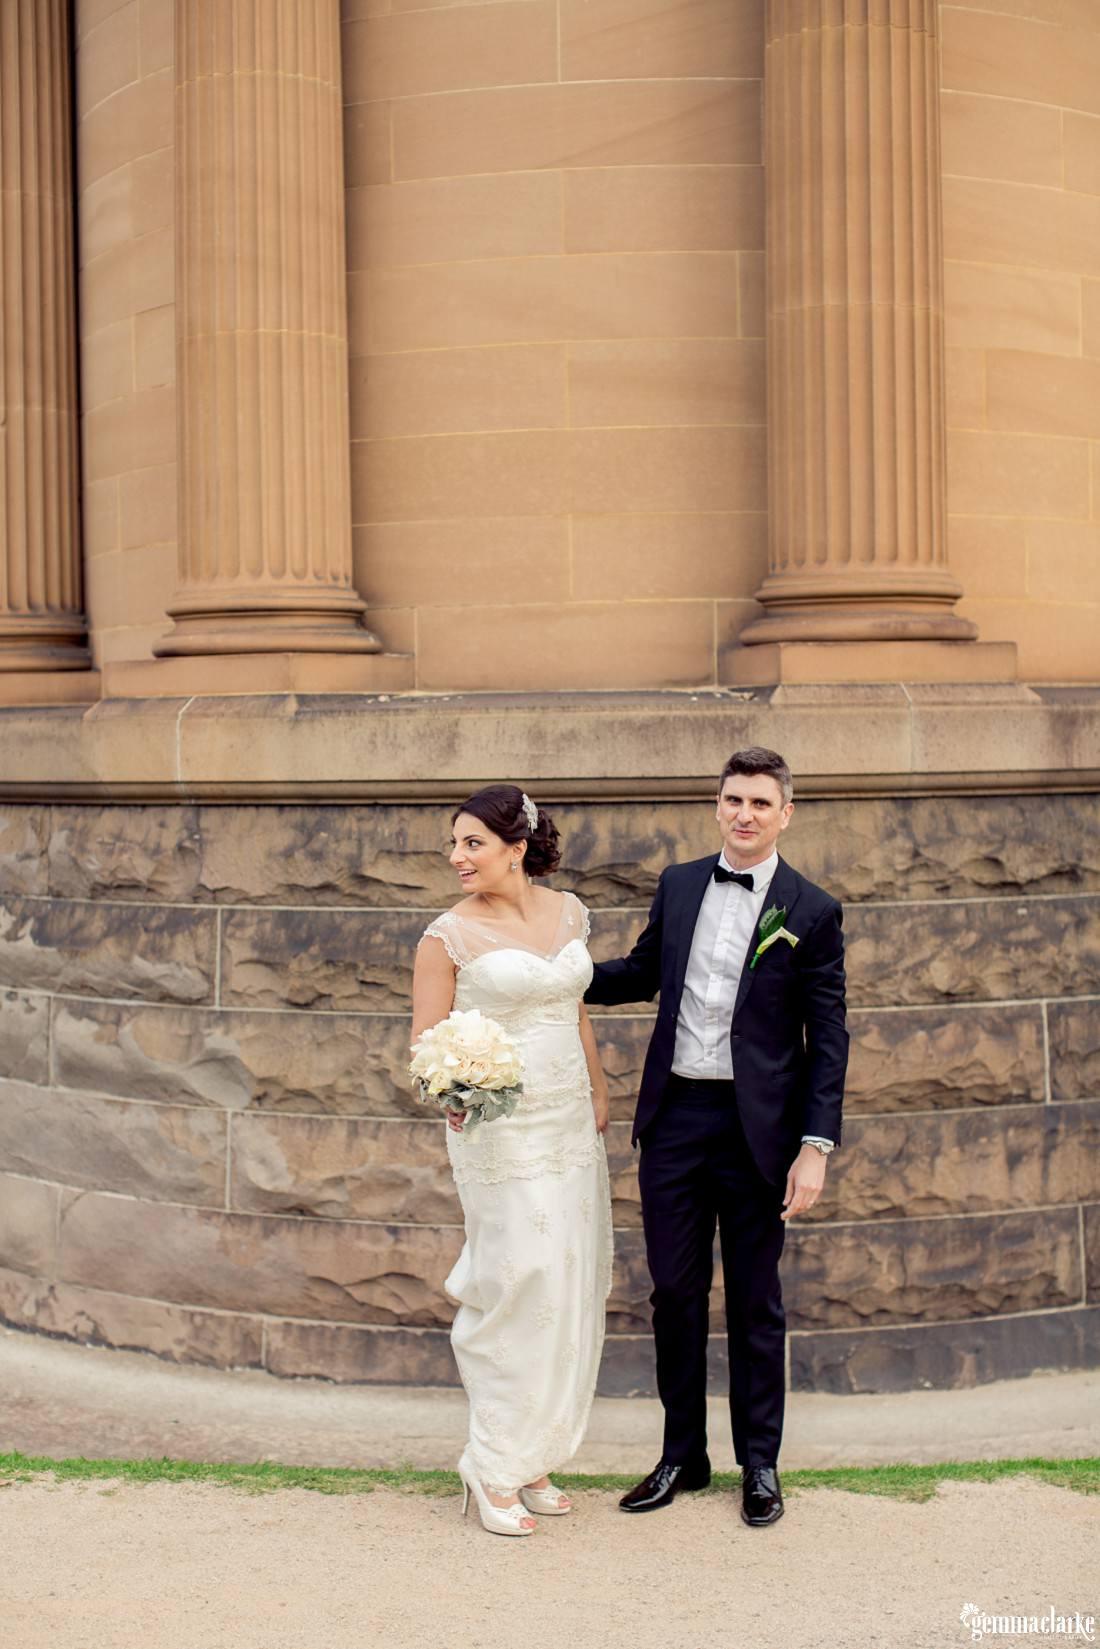 gemma-clarke-photography_botanic-gardens-wedding-reception_amanda-and-dylan_0038